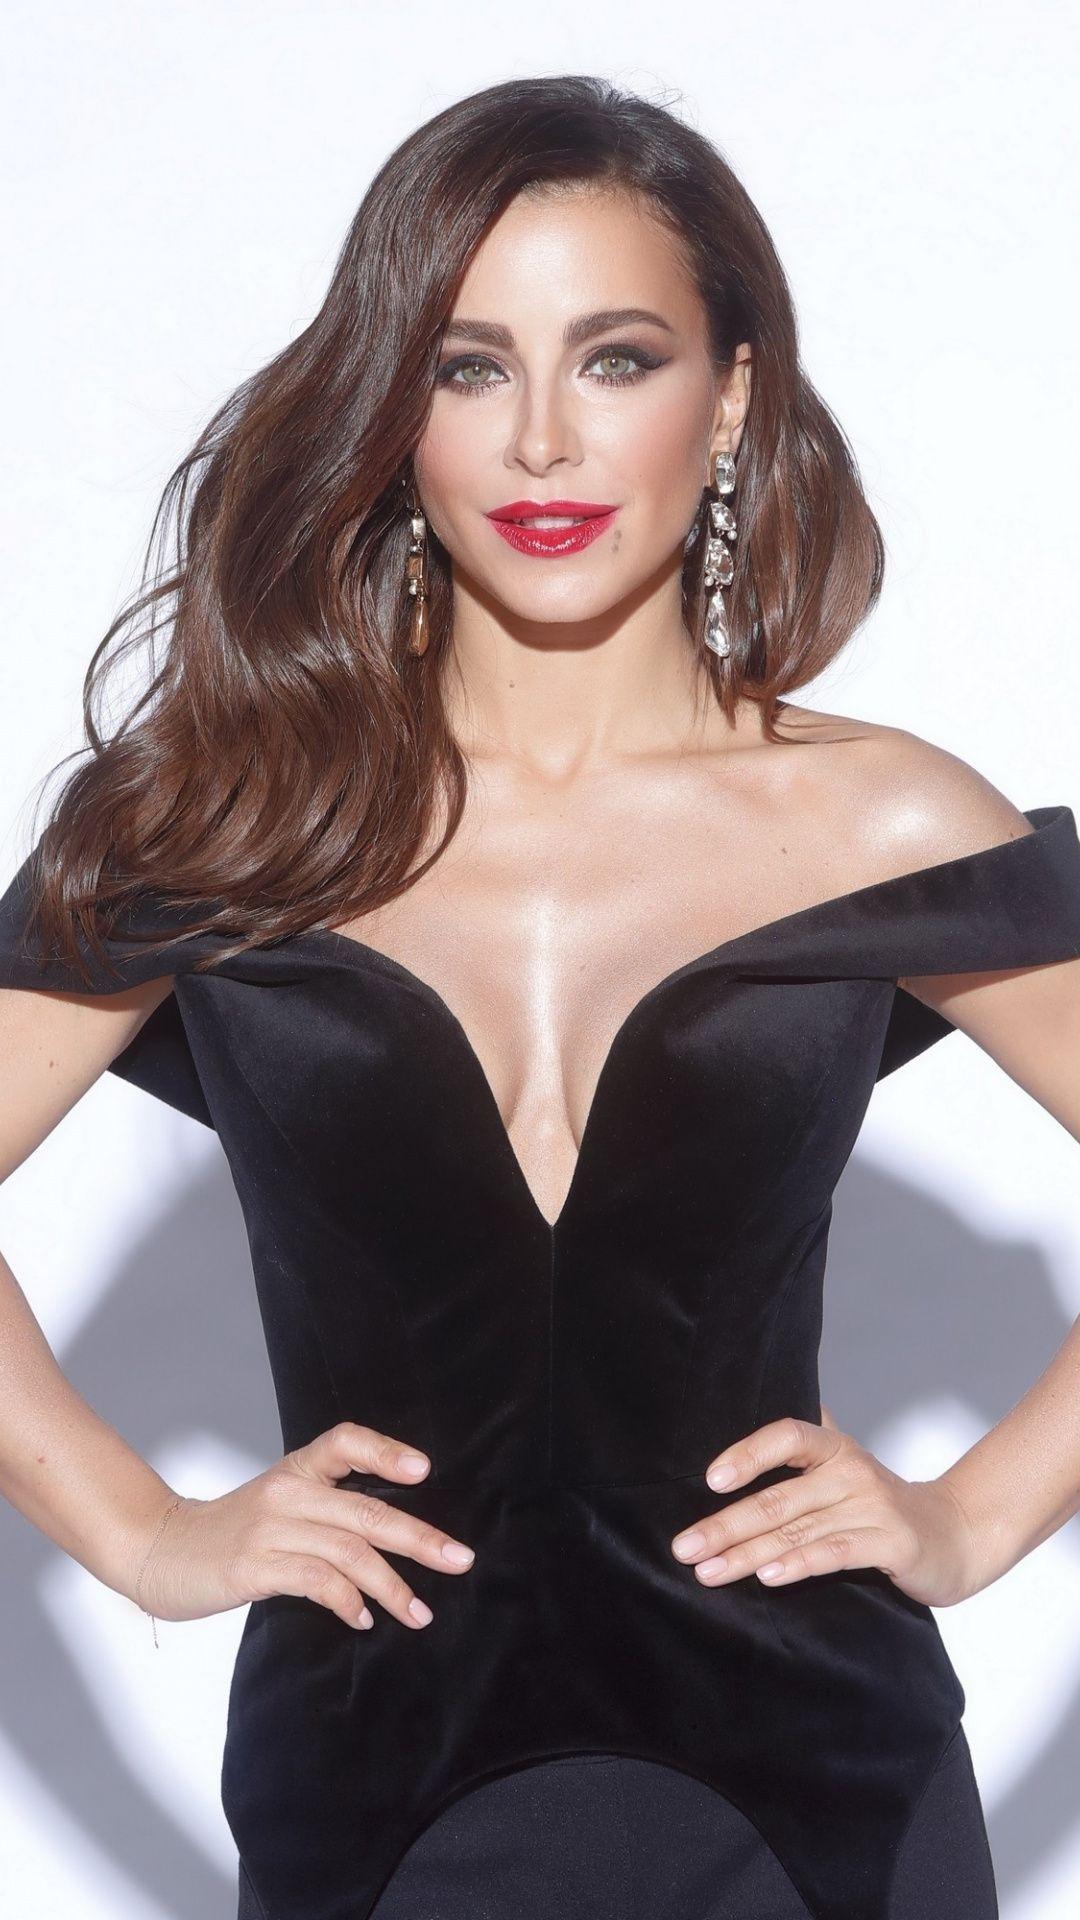 1080x1920 Red Lips Ani Lorak Gorgeous Wallpaper Fashion Celebrities Female Short Prom Dress